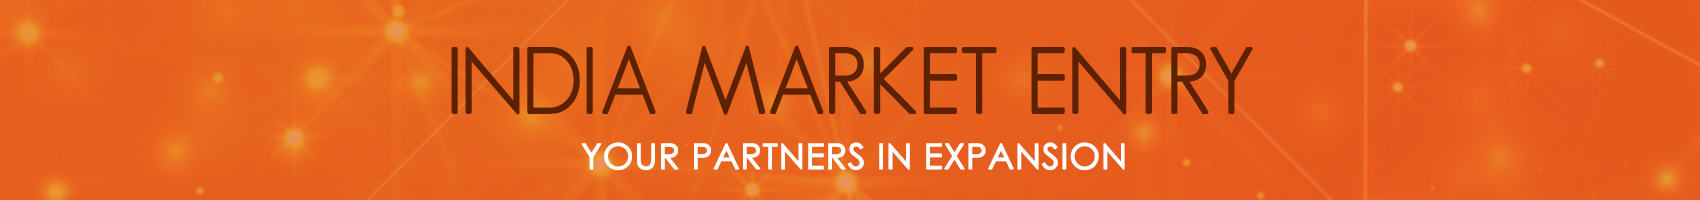 India-Market-entry